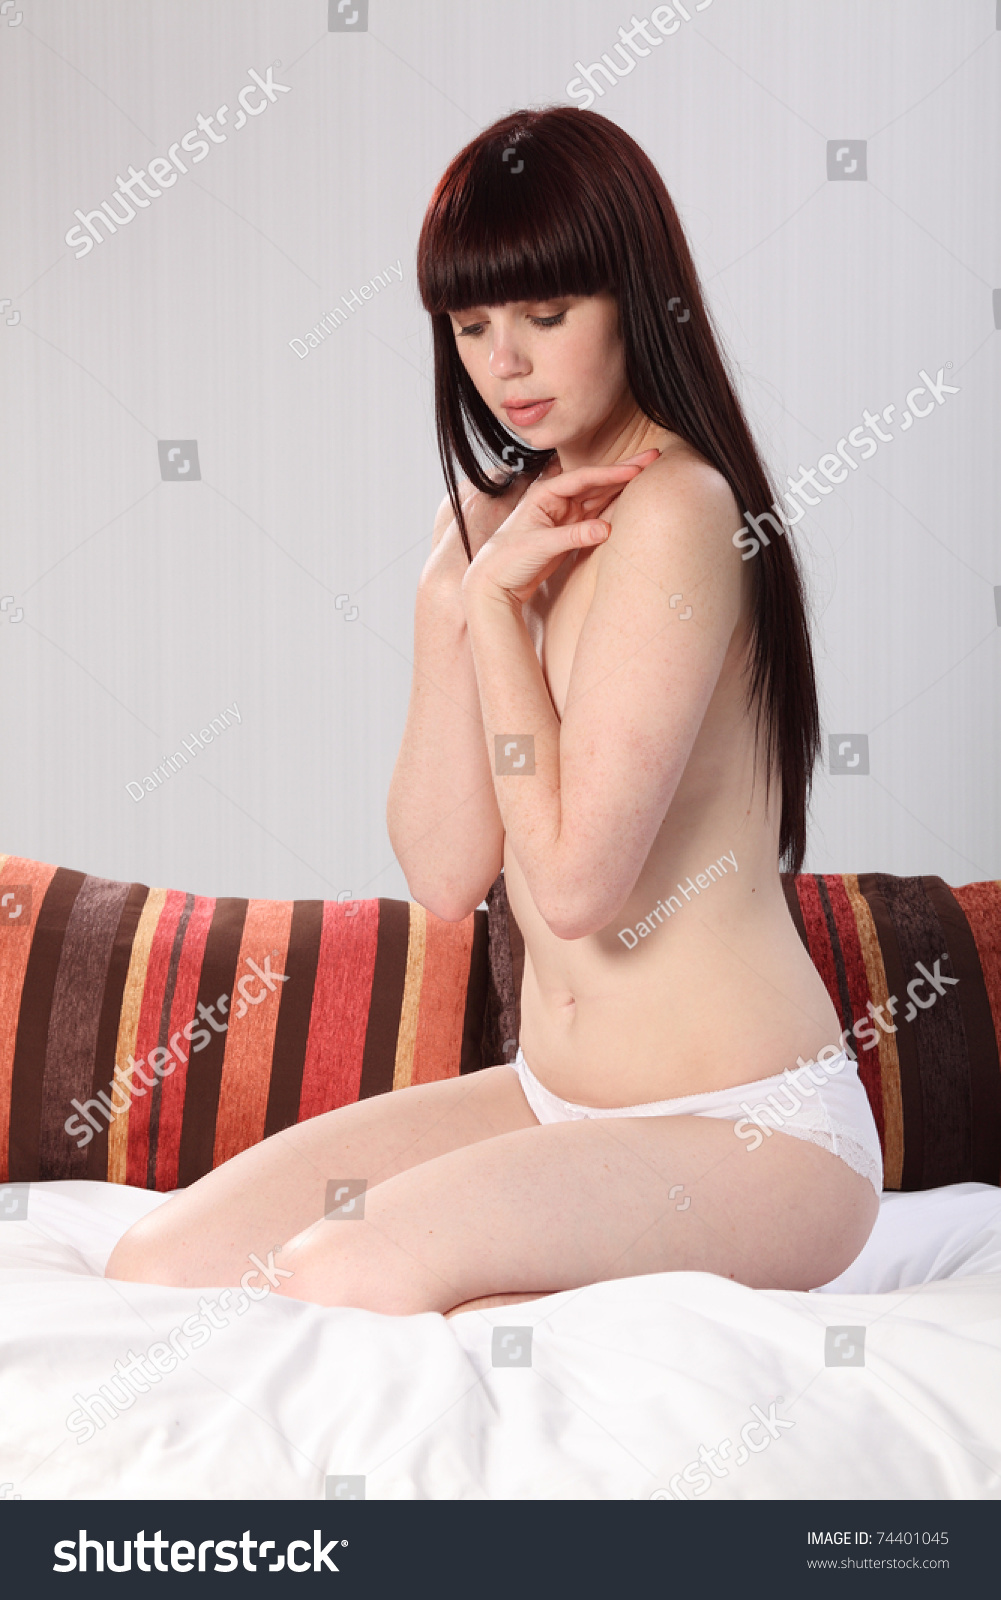 skinny girls nude group